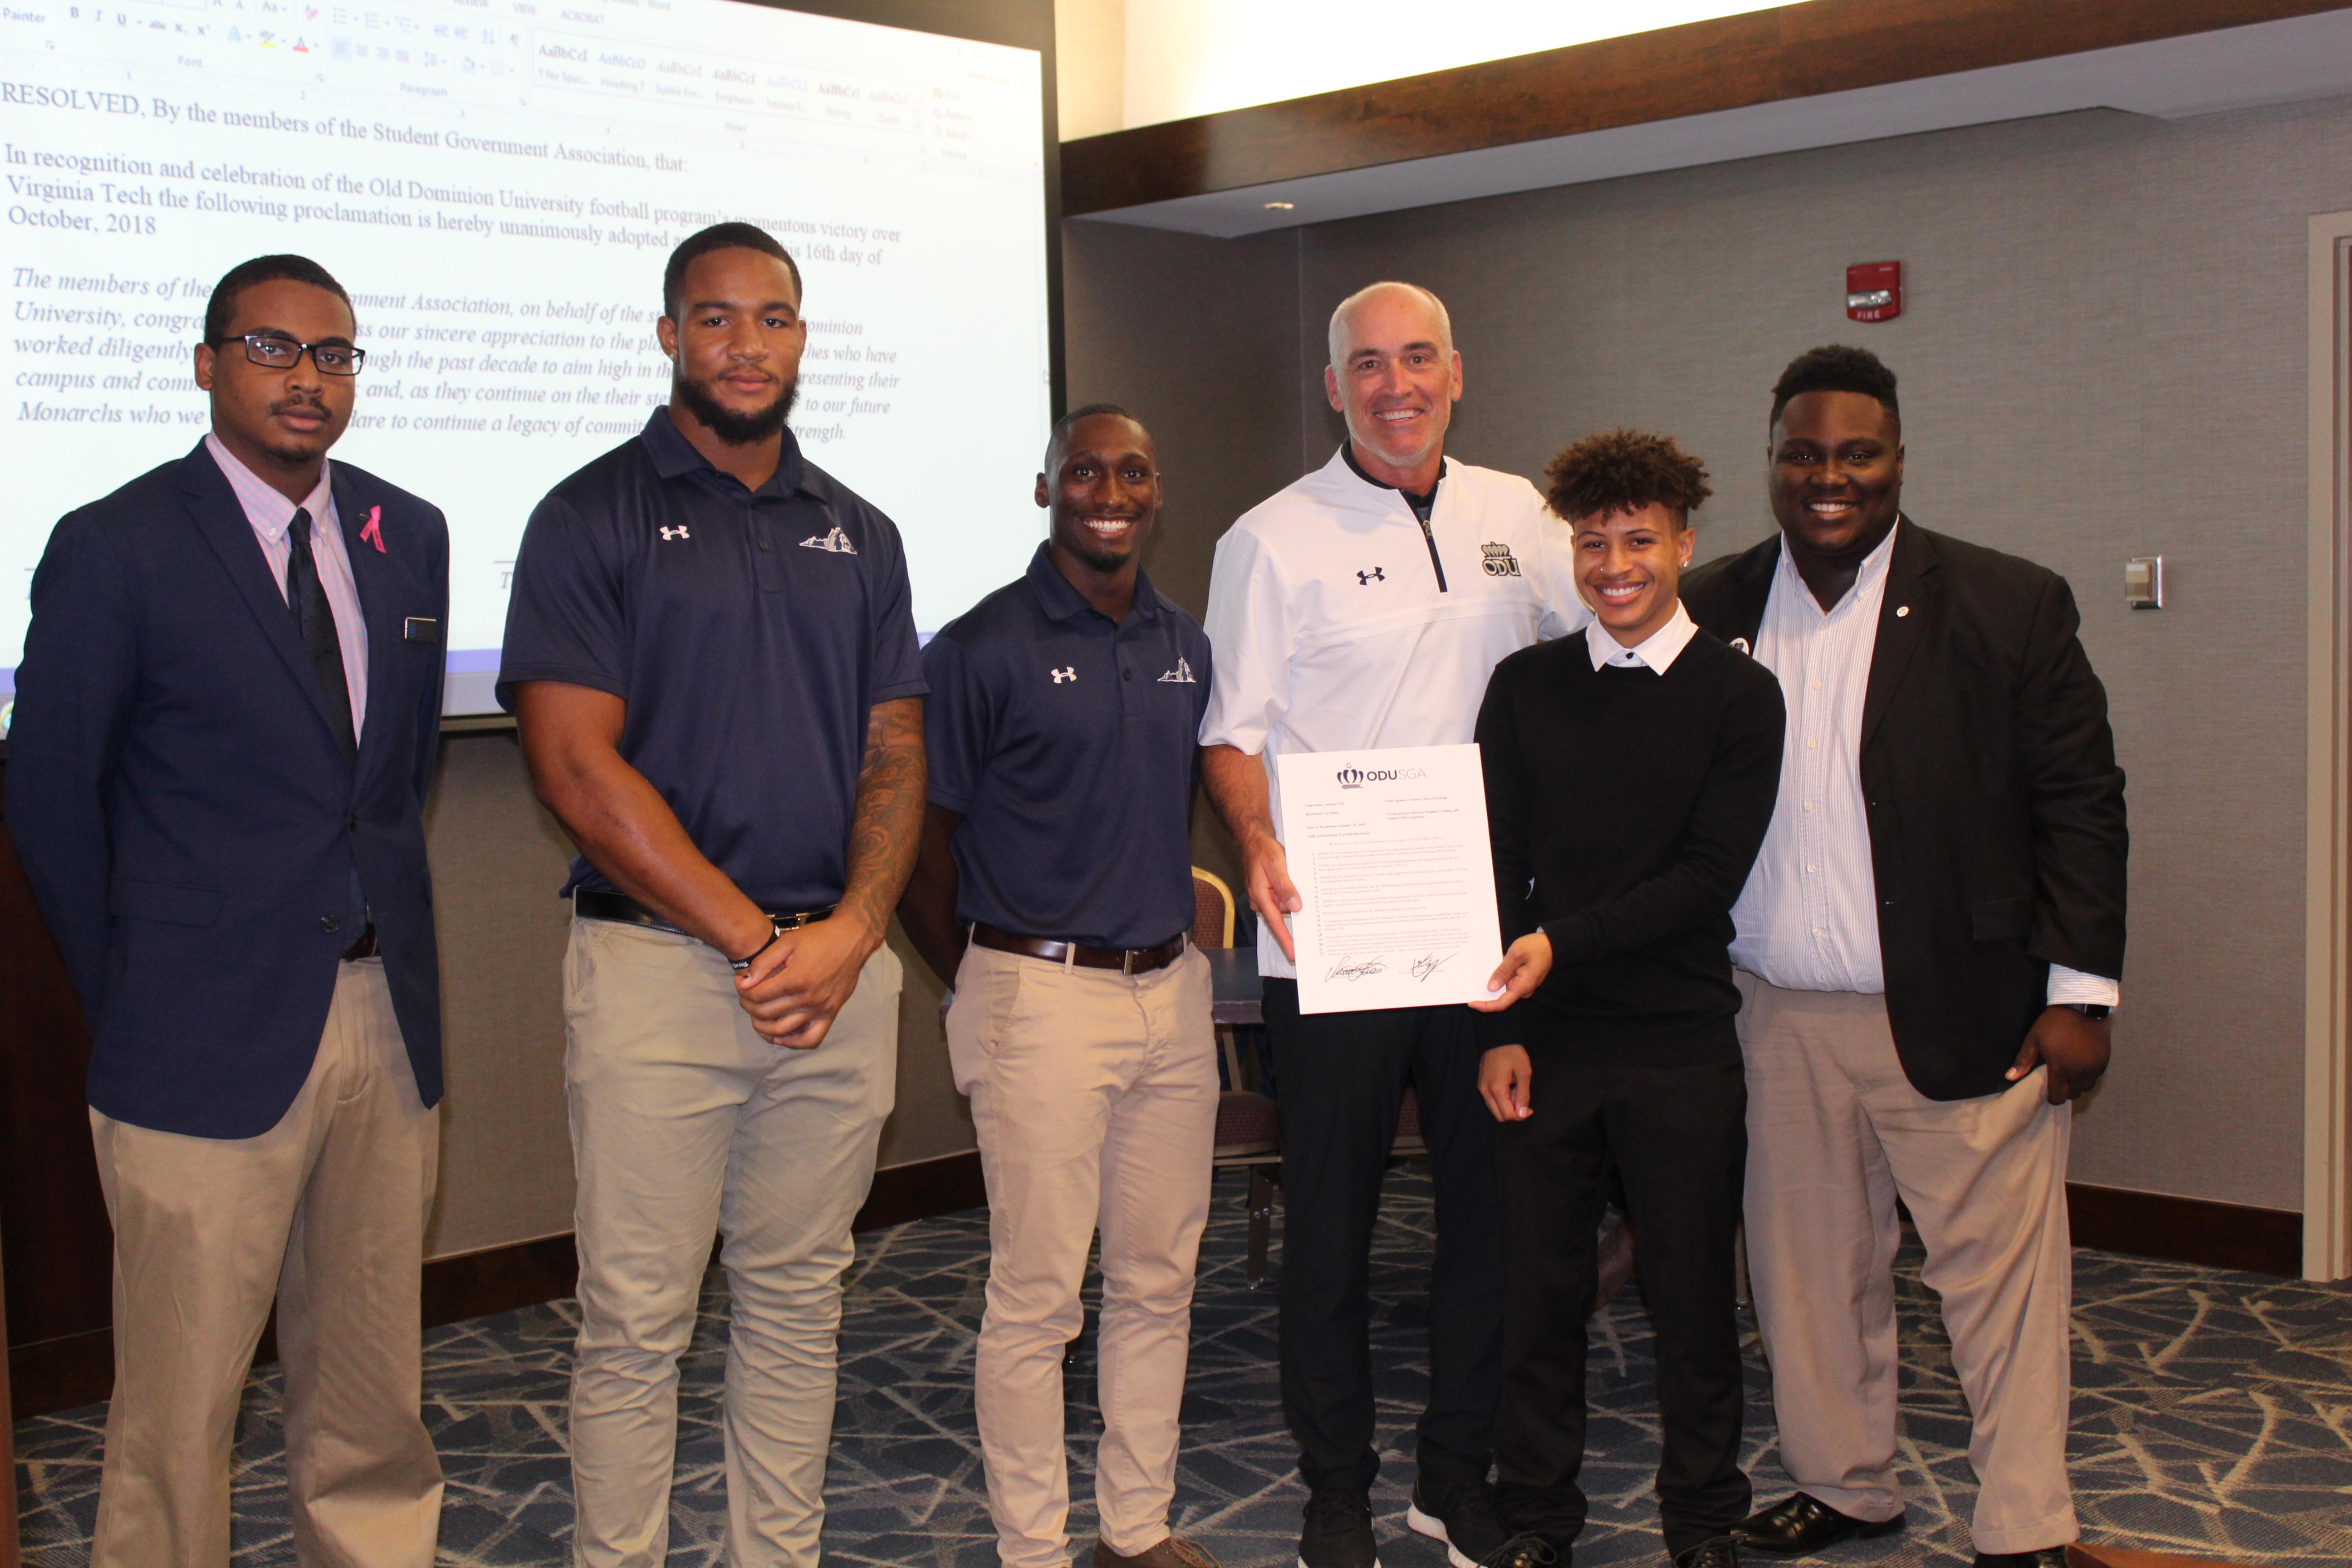 ODU Football Team Recognition | ODU SGA | Old Dominion University